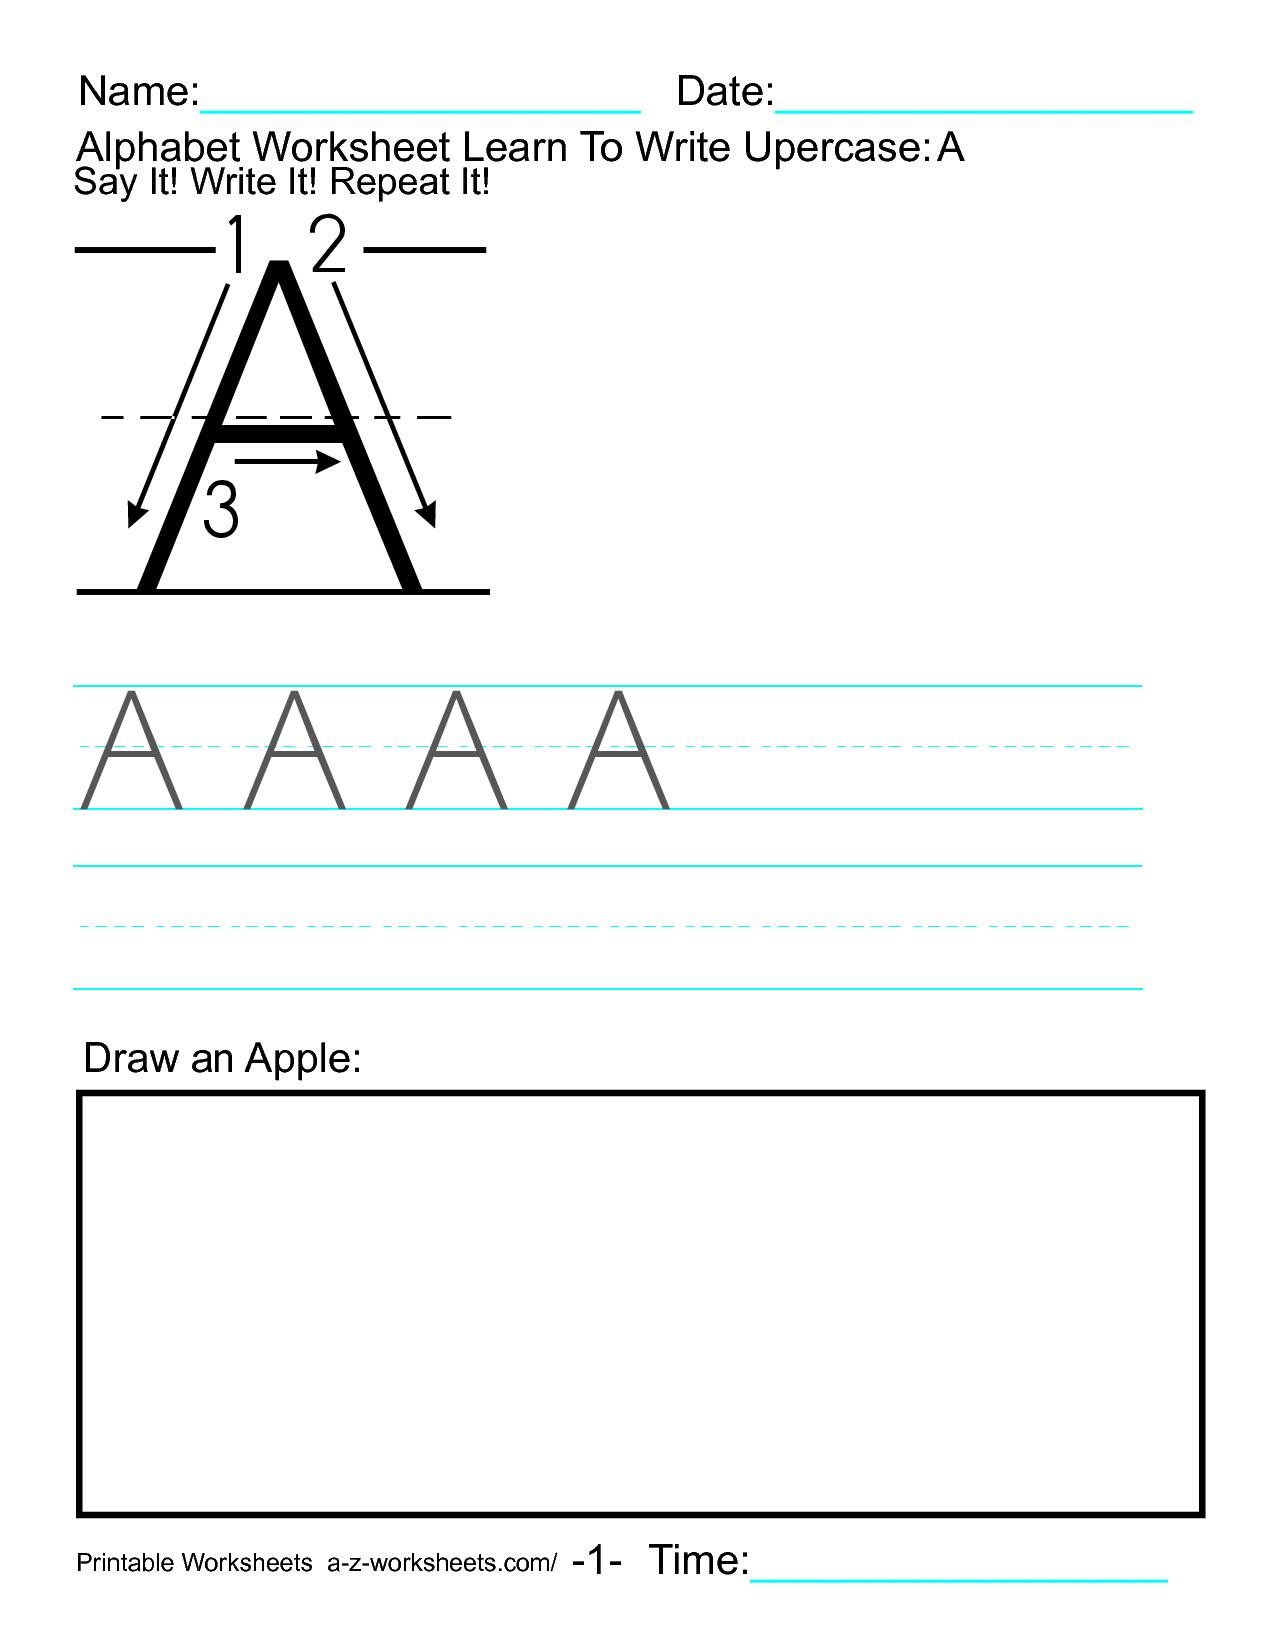 Printable Alphabet Worksheets A Z